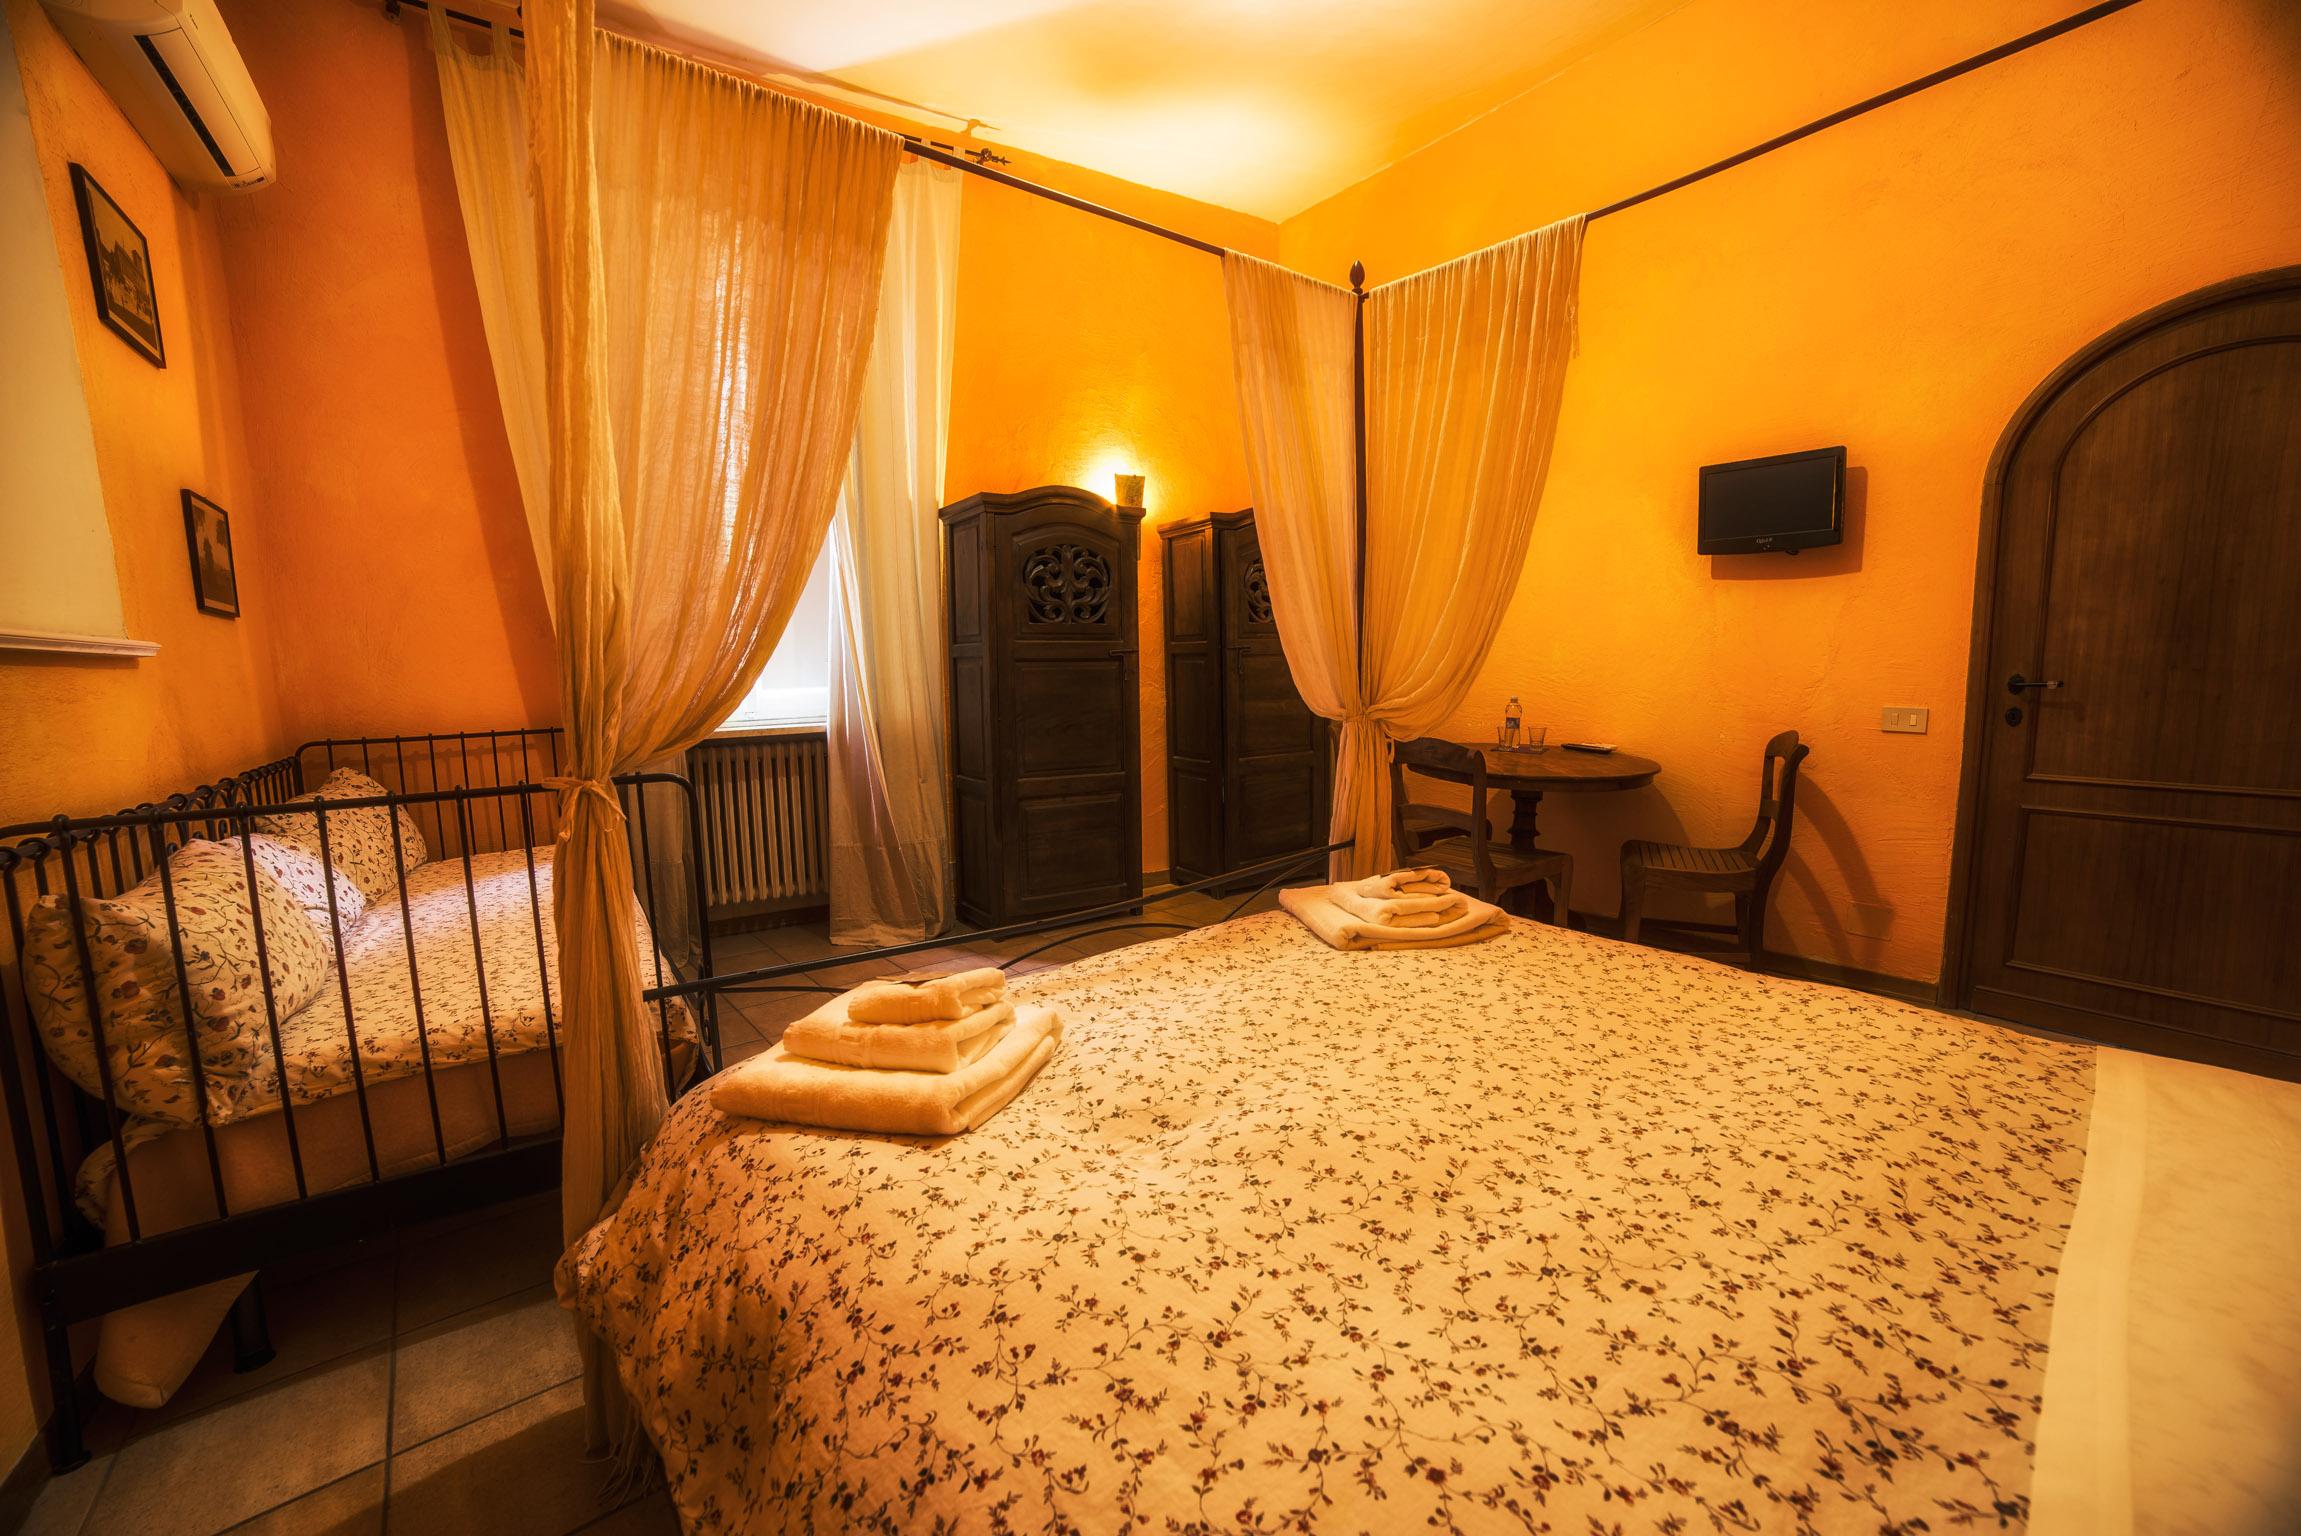 Dove dormire a Gaeta: B&B Millequattrocento